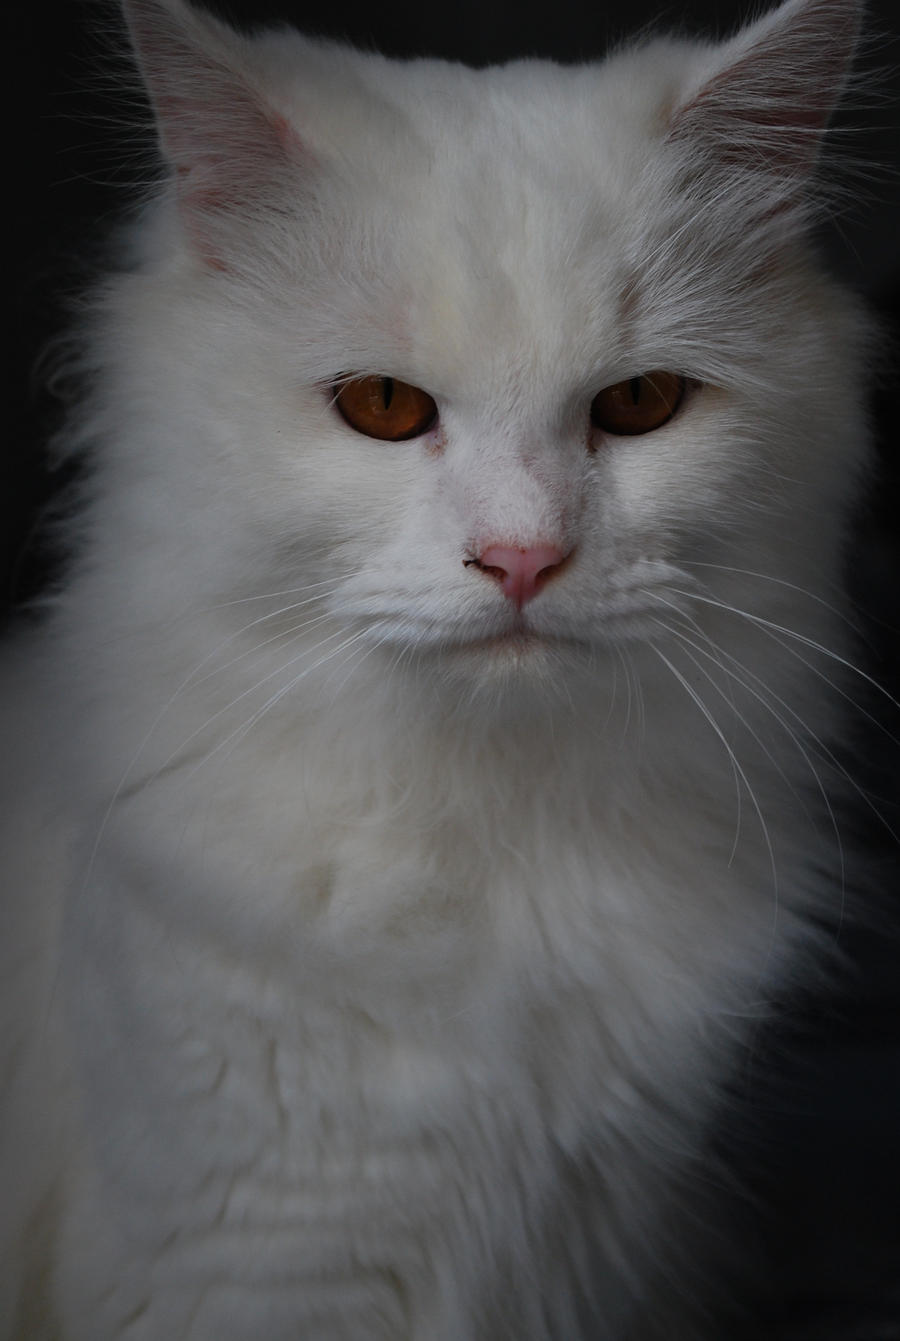 White cat in orange eye by cagraphos on DeviantArt White Cat With Orange Eyes